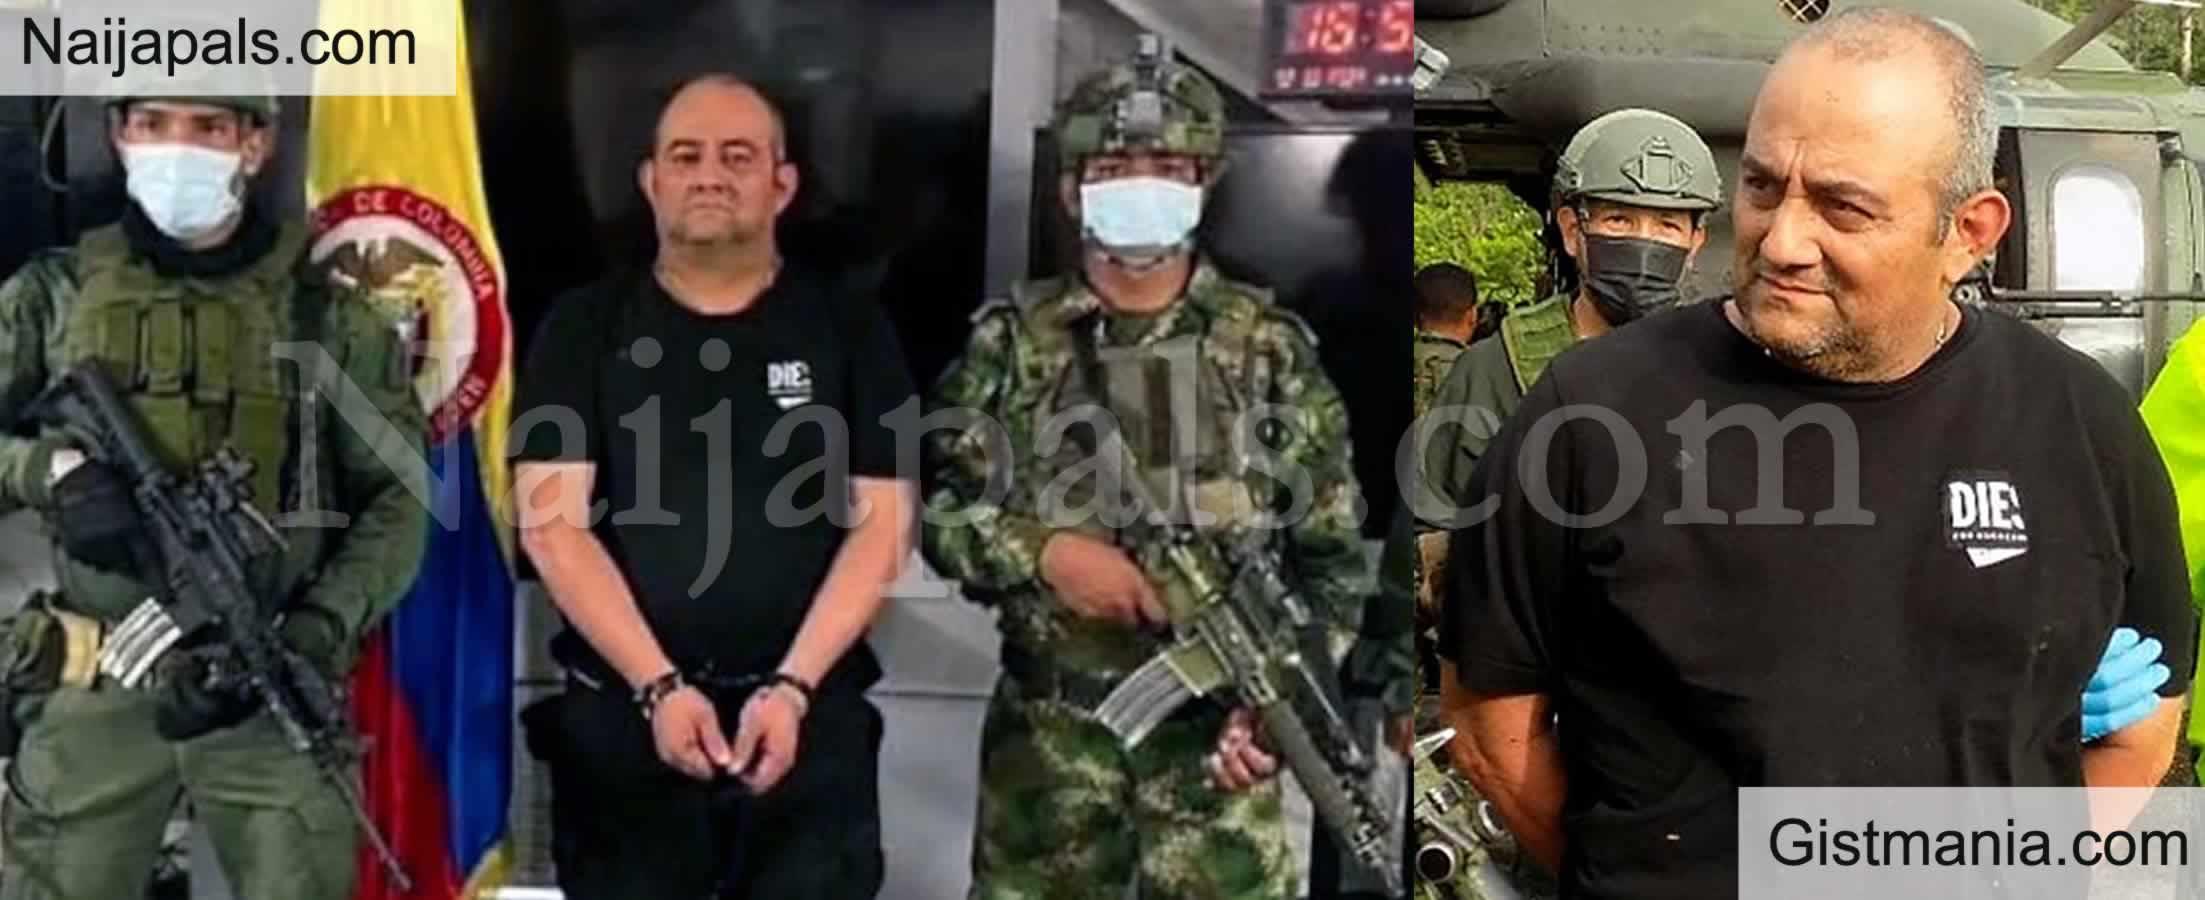 <img alt='.' class='lazyload' data-src='https://img.gistmania.com/emot/news.gif' /> <b>How Colombia's Most Wanted Drug Lord, Dairo Antonio Úsuga a.k.a Otoniel Was Captured</b>